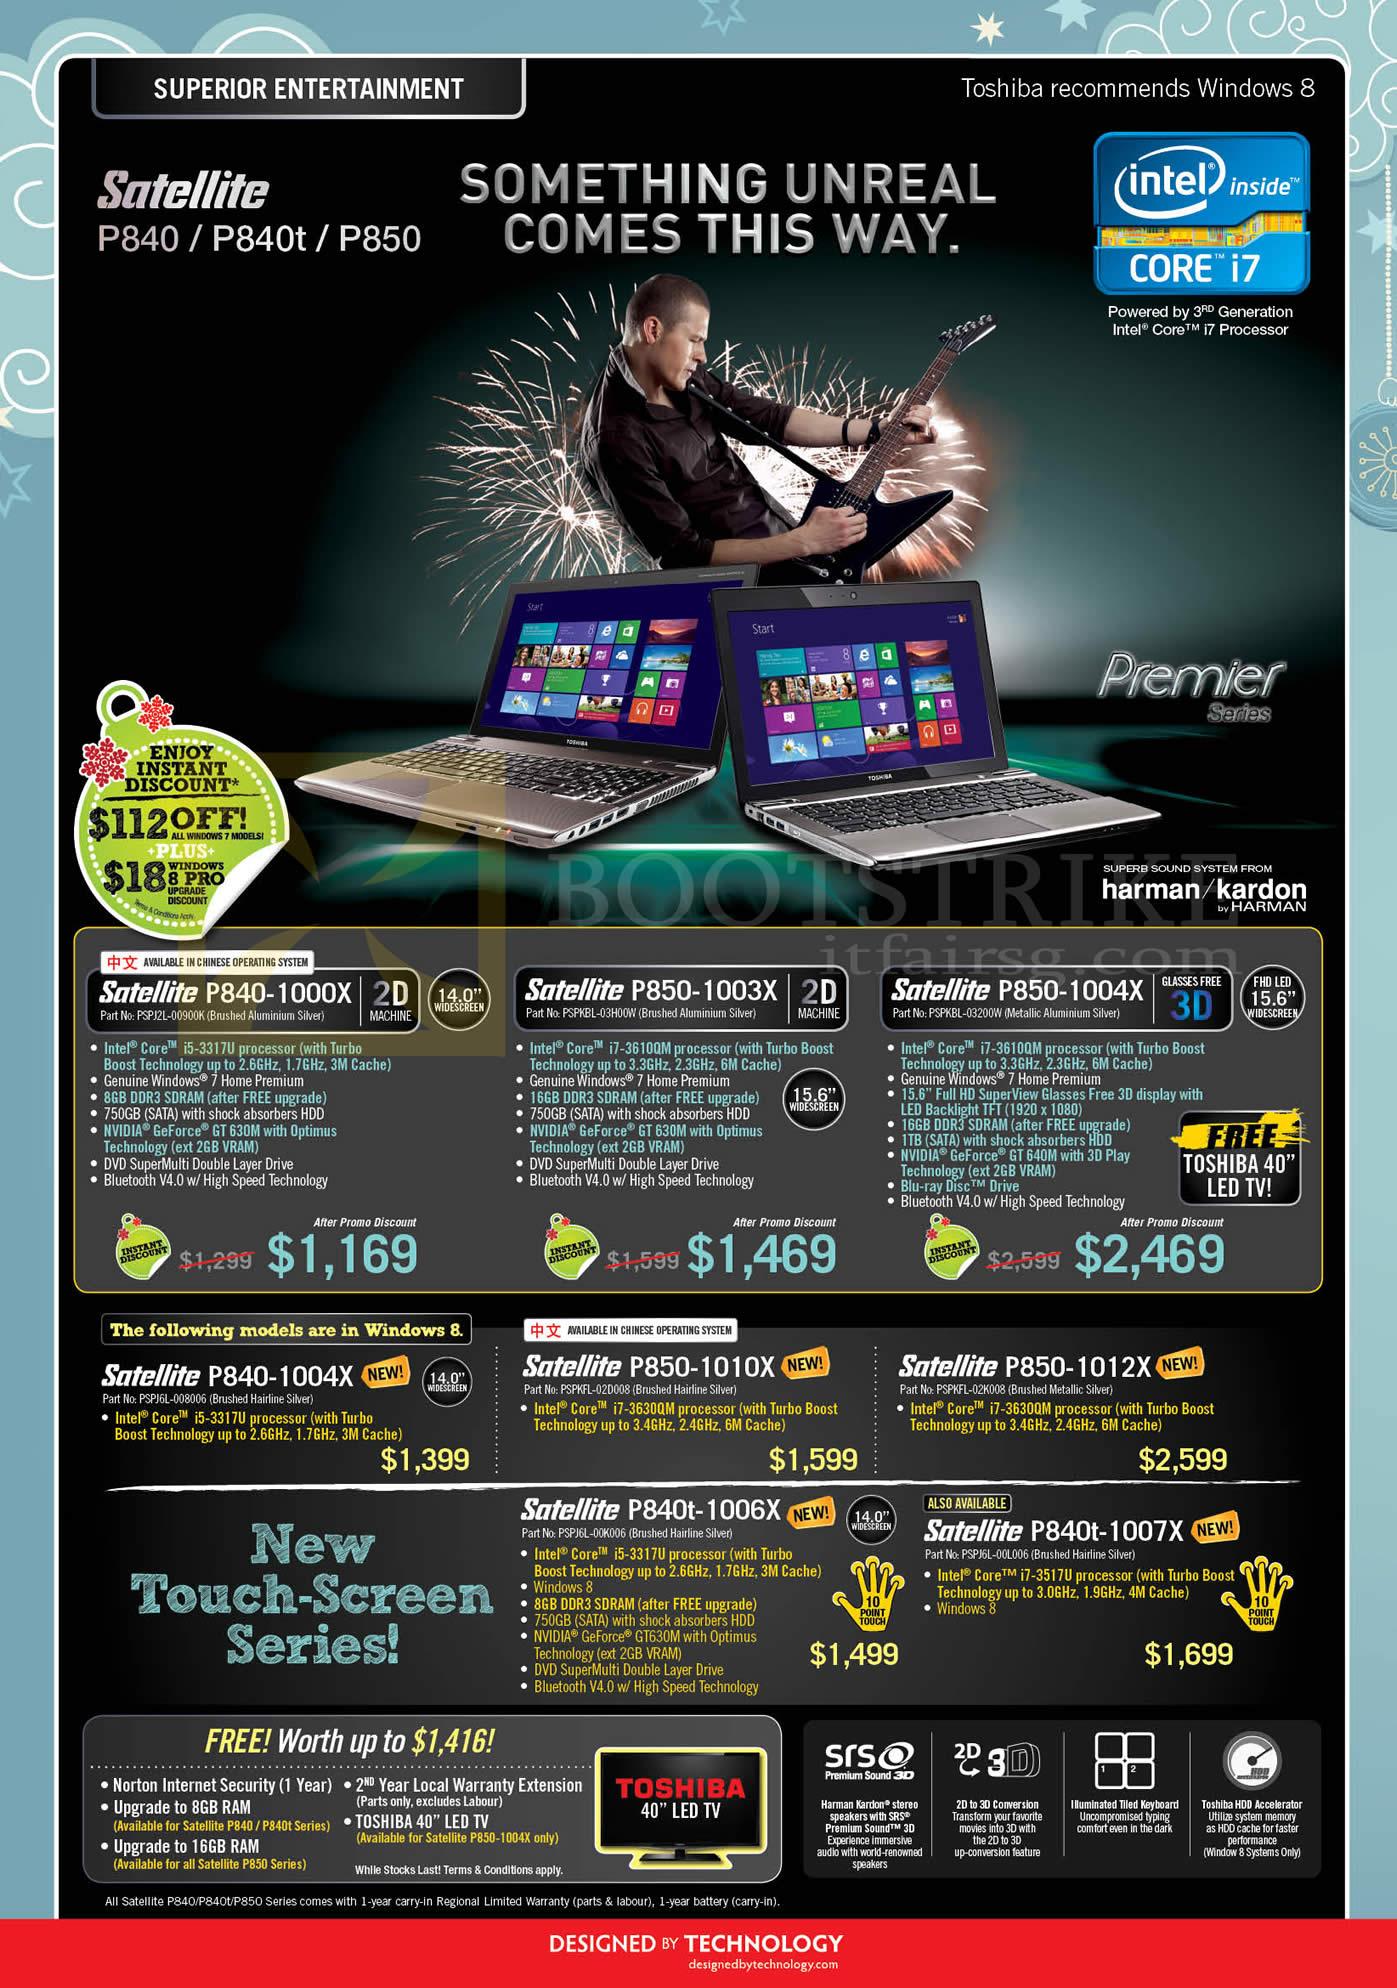 SITEX 2012 price list image brochure of Toshiba Notebooks Satellite P840-1000X, P840t-1006X, P840t-1007X, P850-1003X, P850-1004X, P850-1010X, P850-1012X